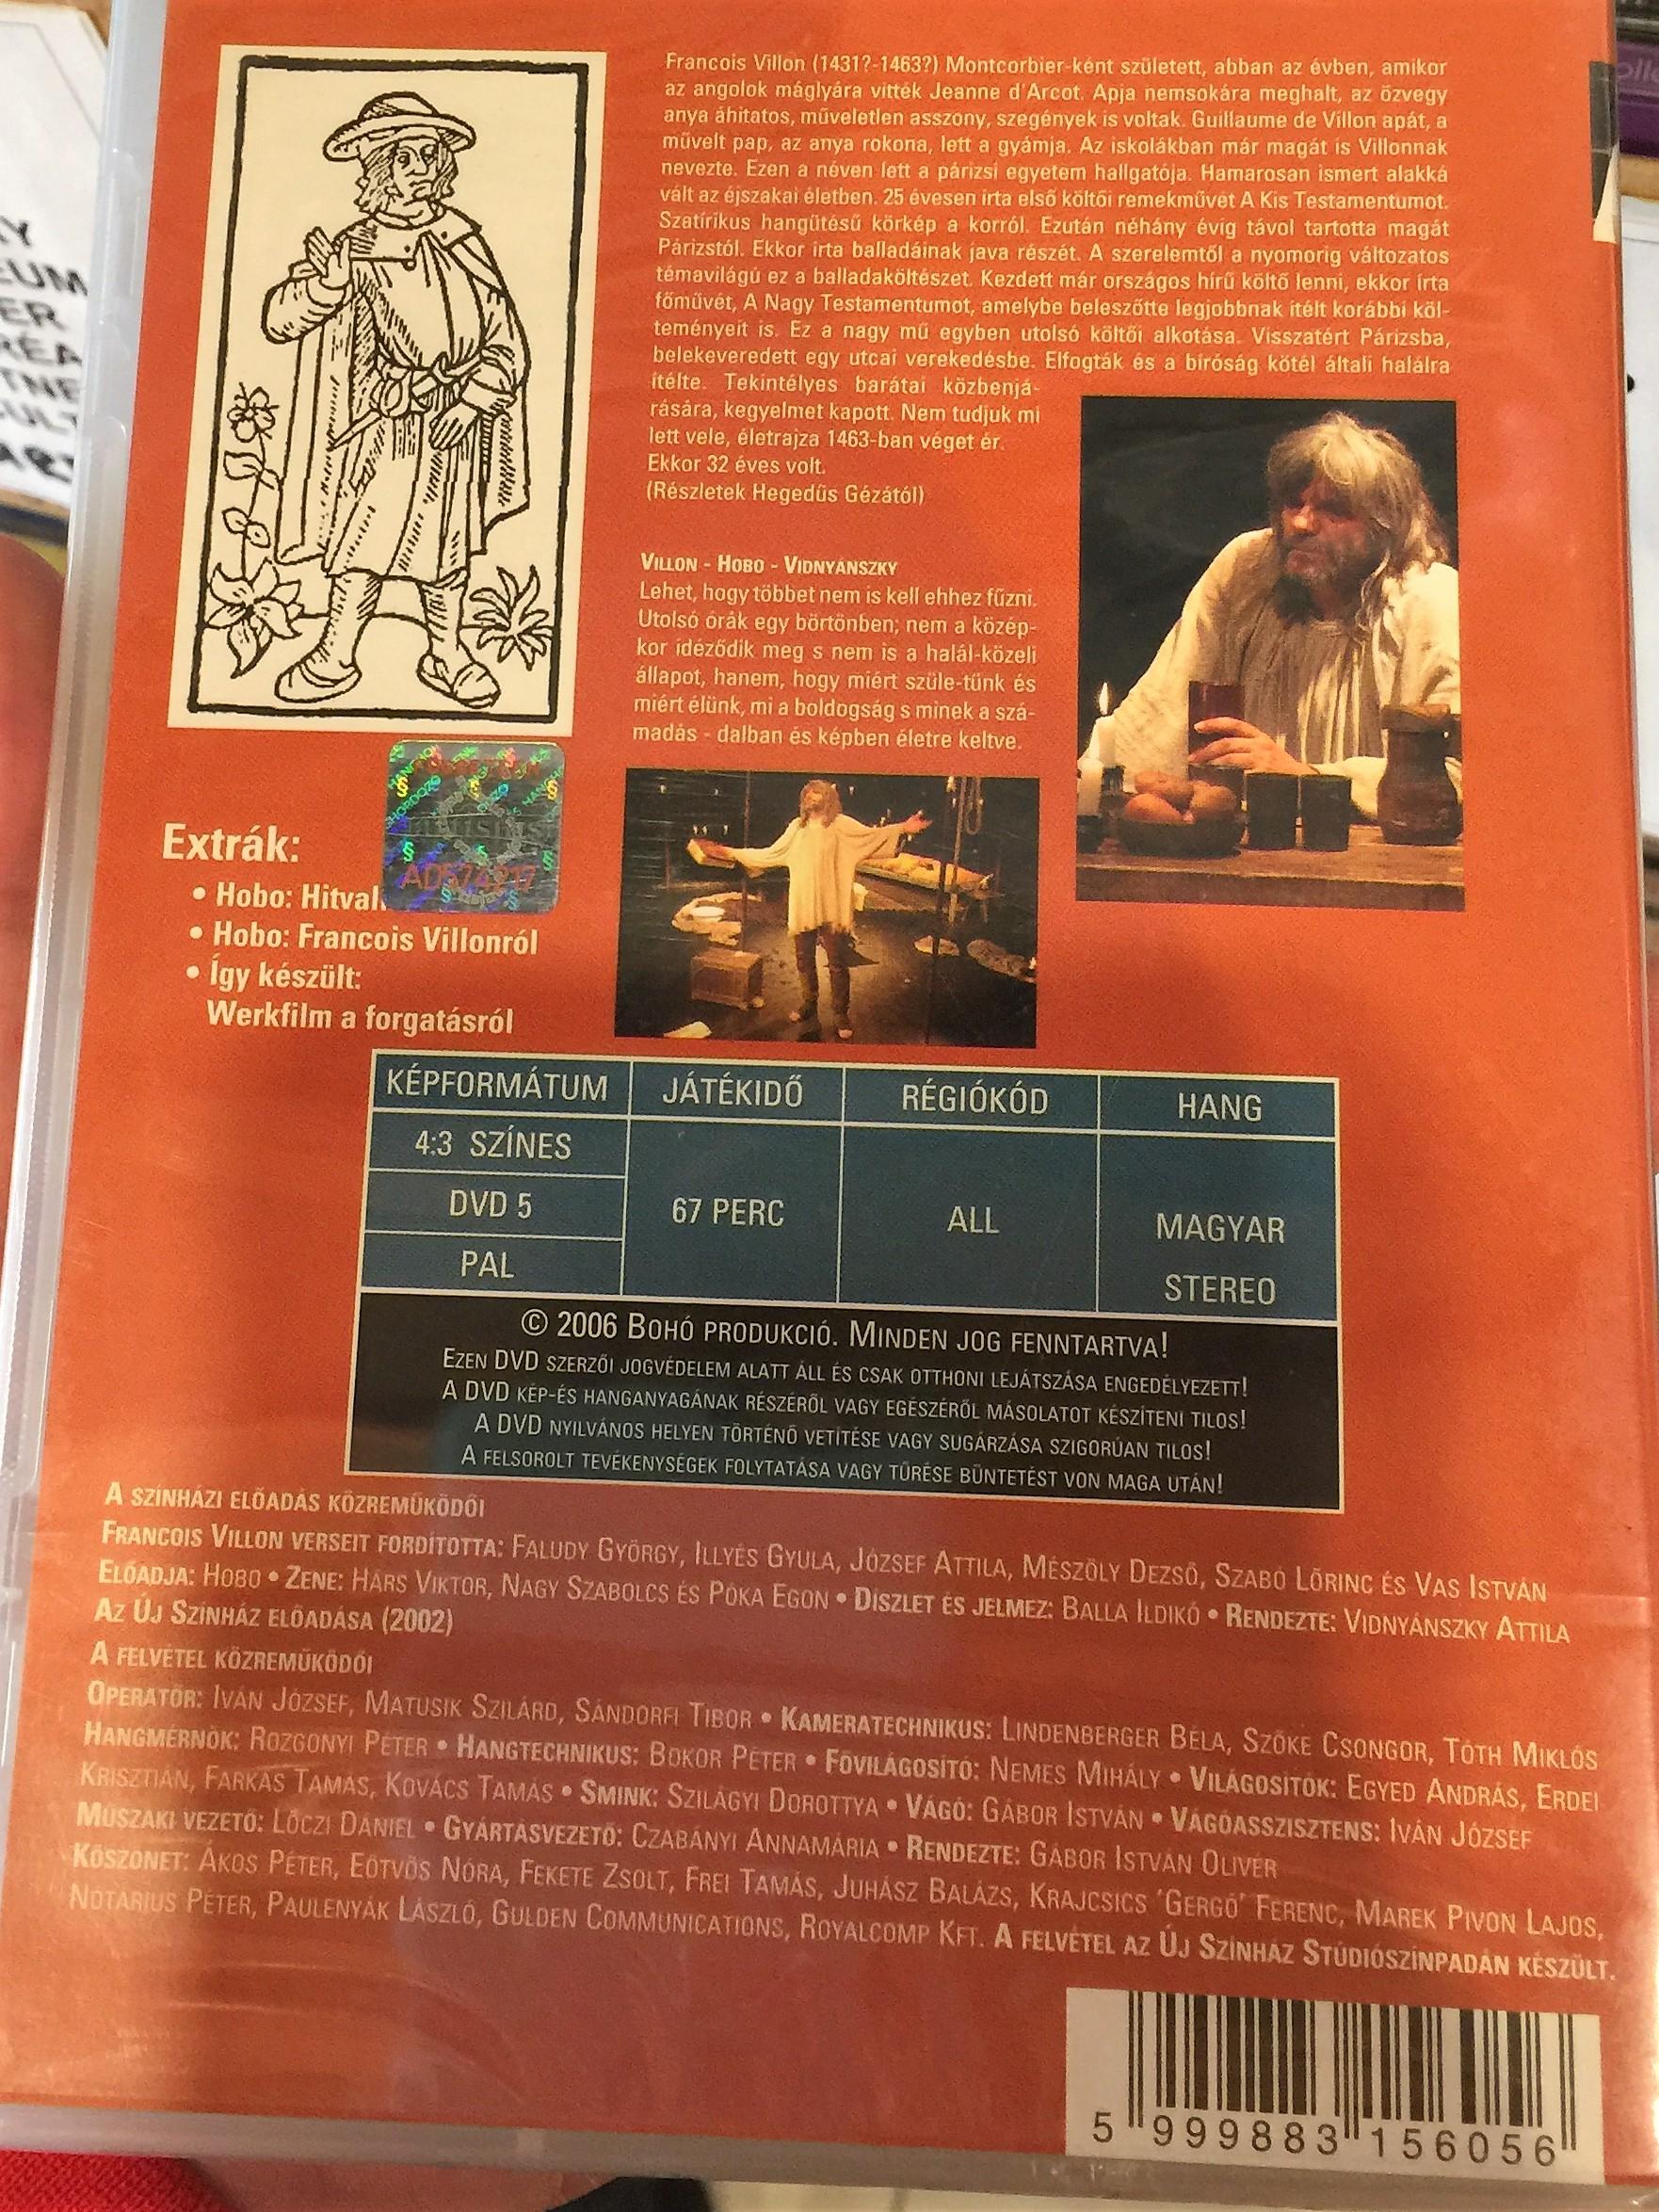 az-akasztottak-ballad-ja-dvd-2006-francois-villon-versei-el-adja-hobo-poems-of-francois-villon-in-hungarian-language-presented-by-f-ldes-l-szl-hobo-2-.jpg